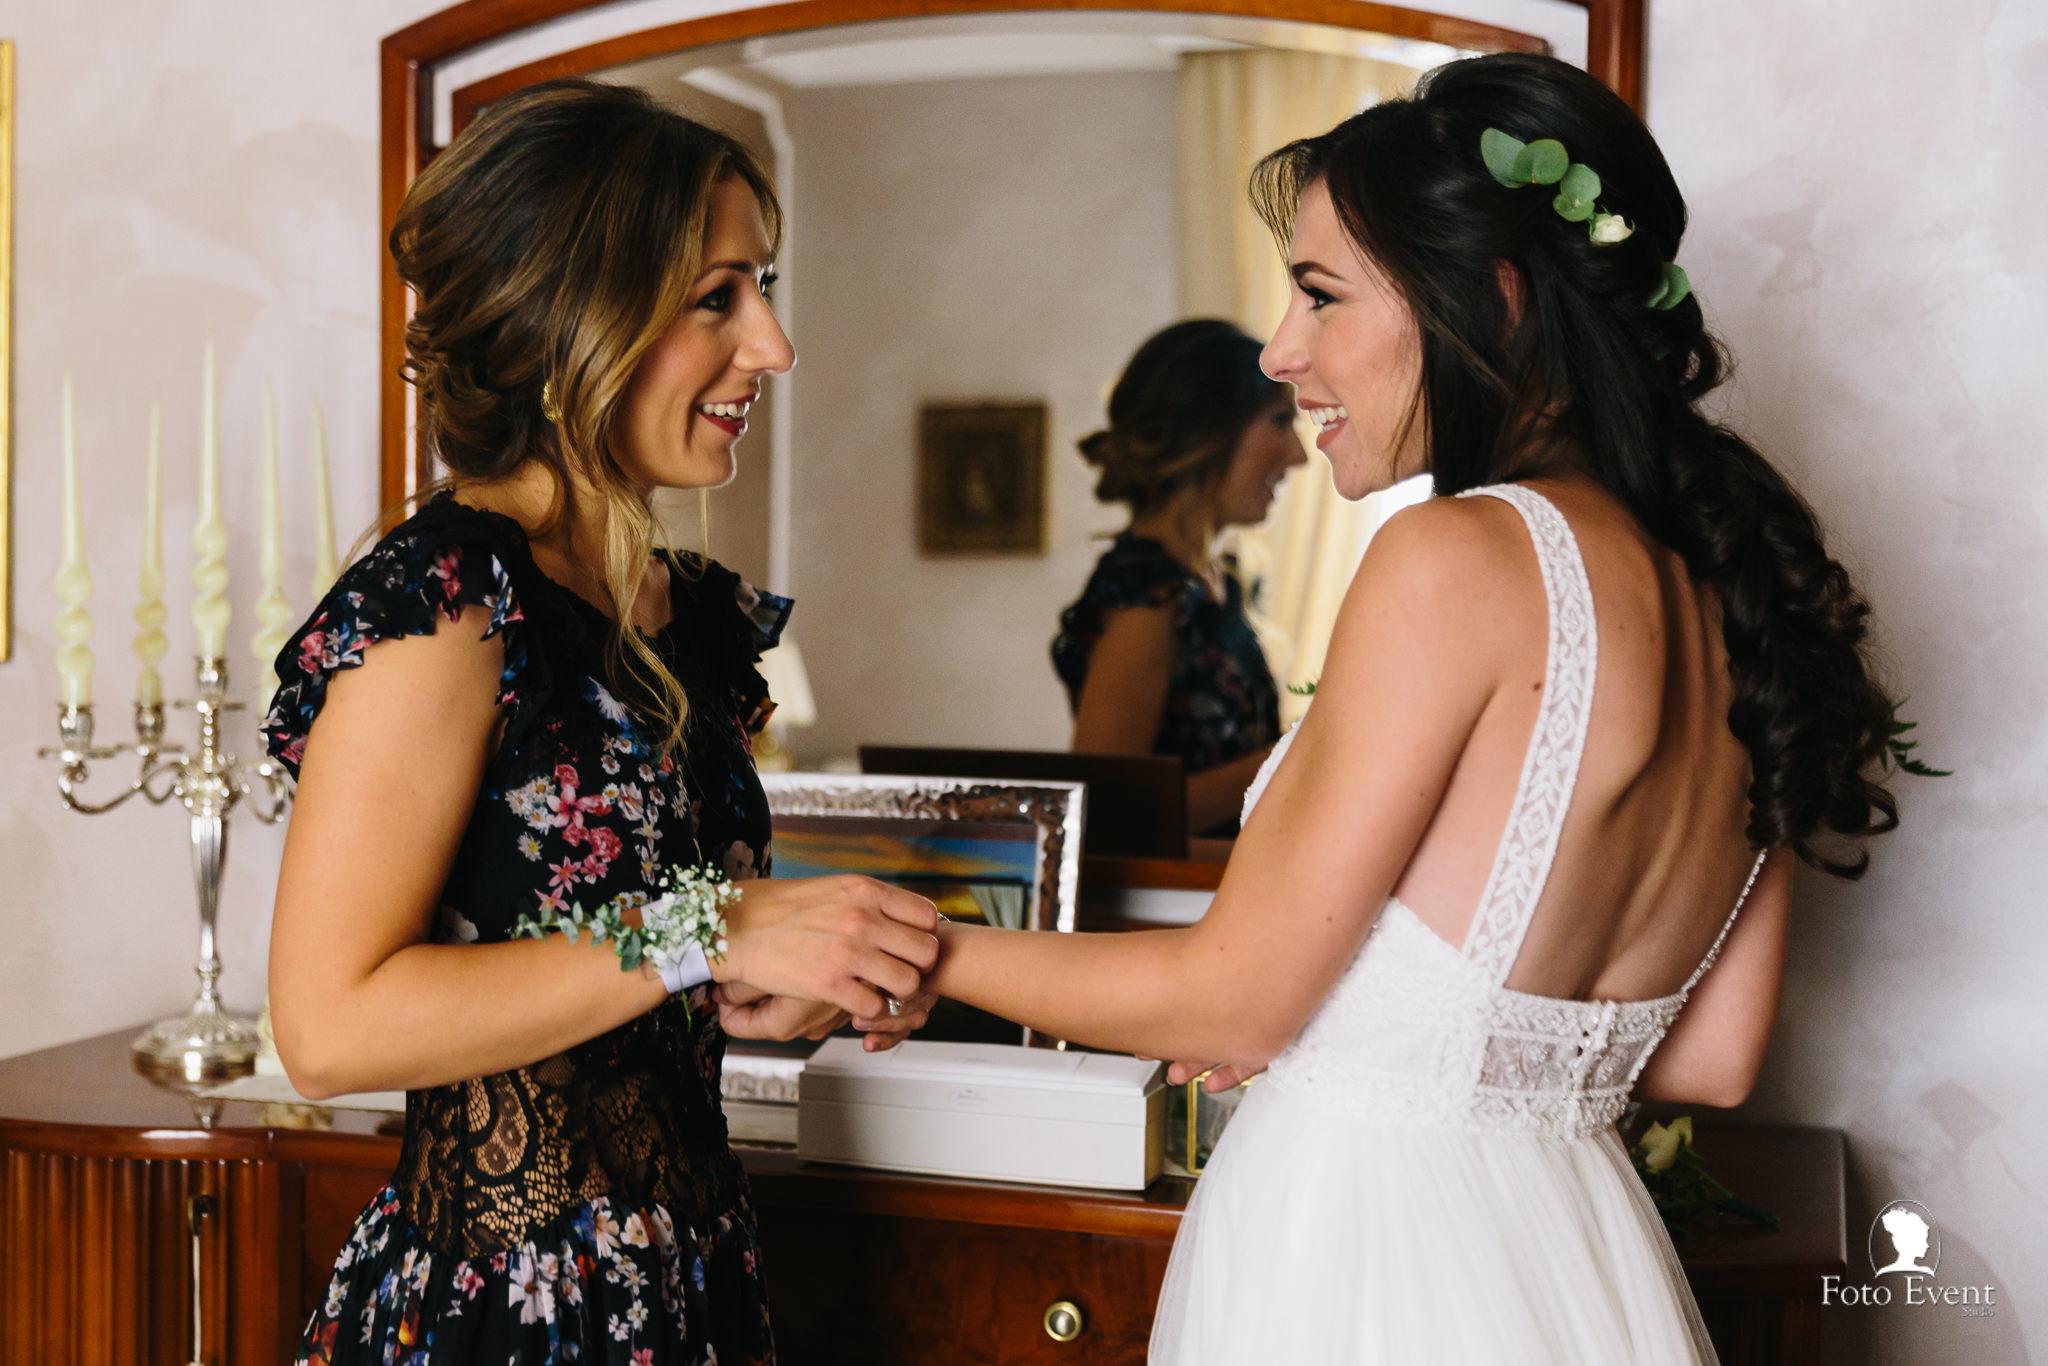 015-2019-08-23-Matrimonio-Lucia-e-Rosario-Scopelliti-5DE-805